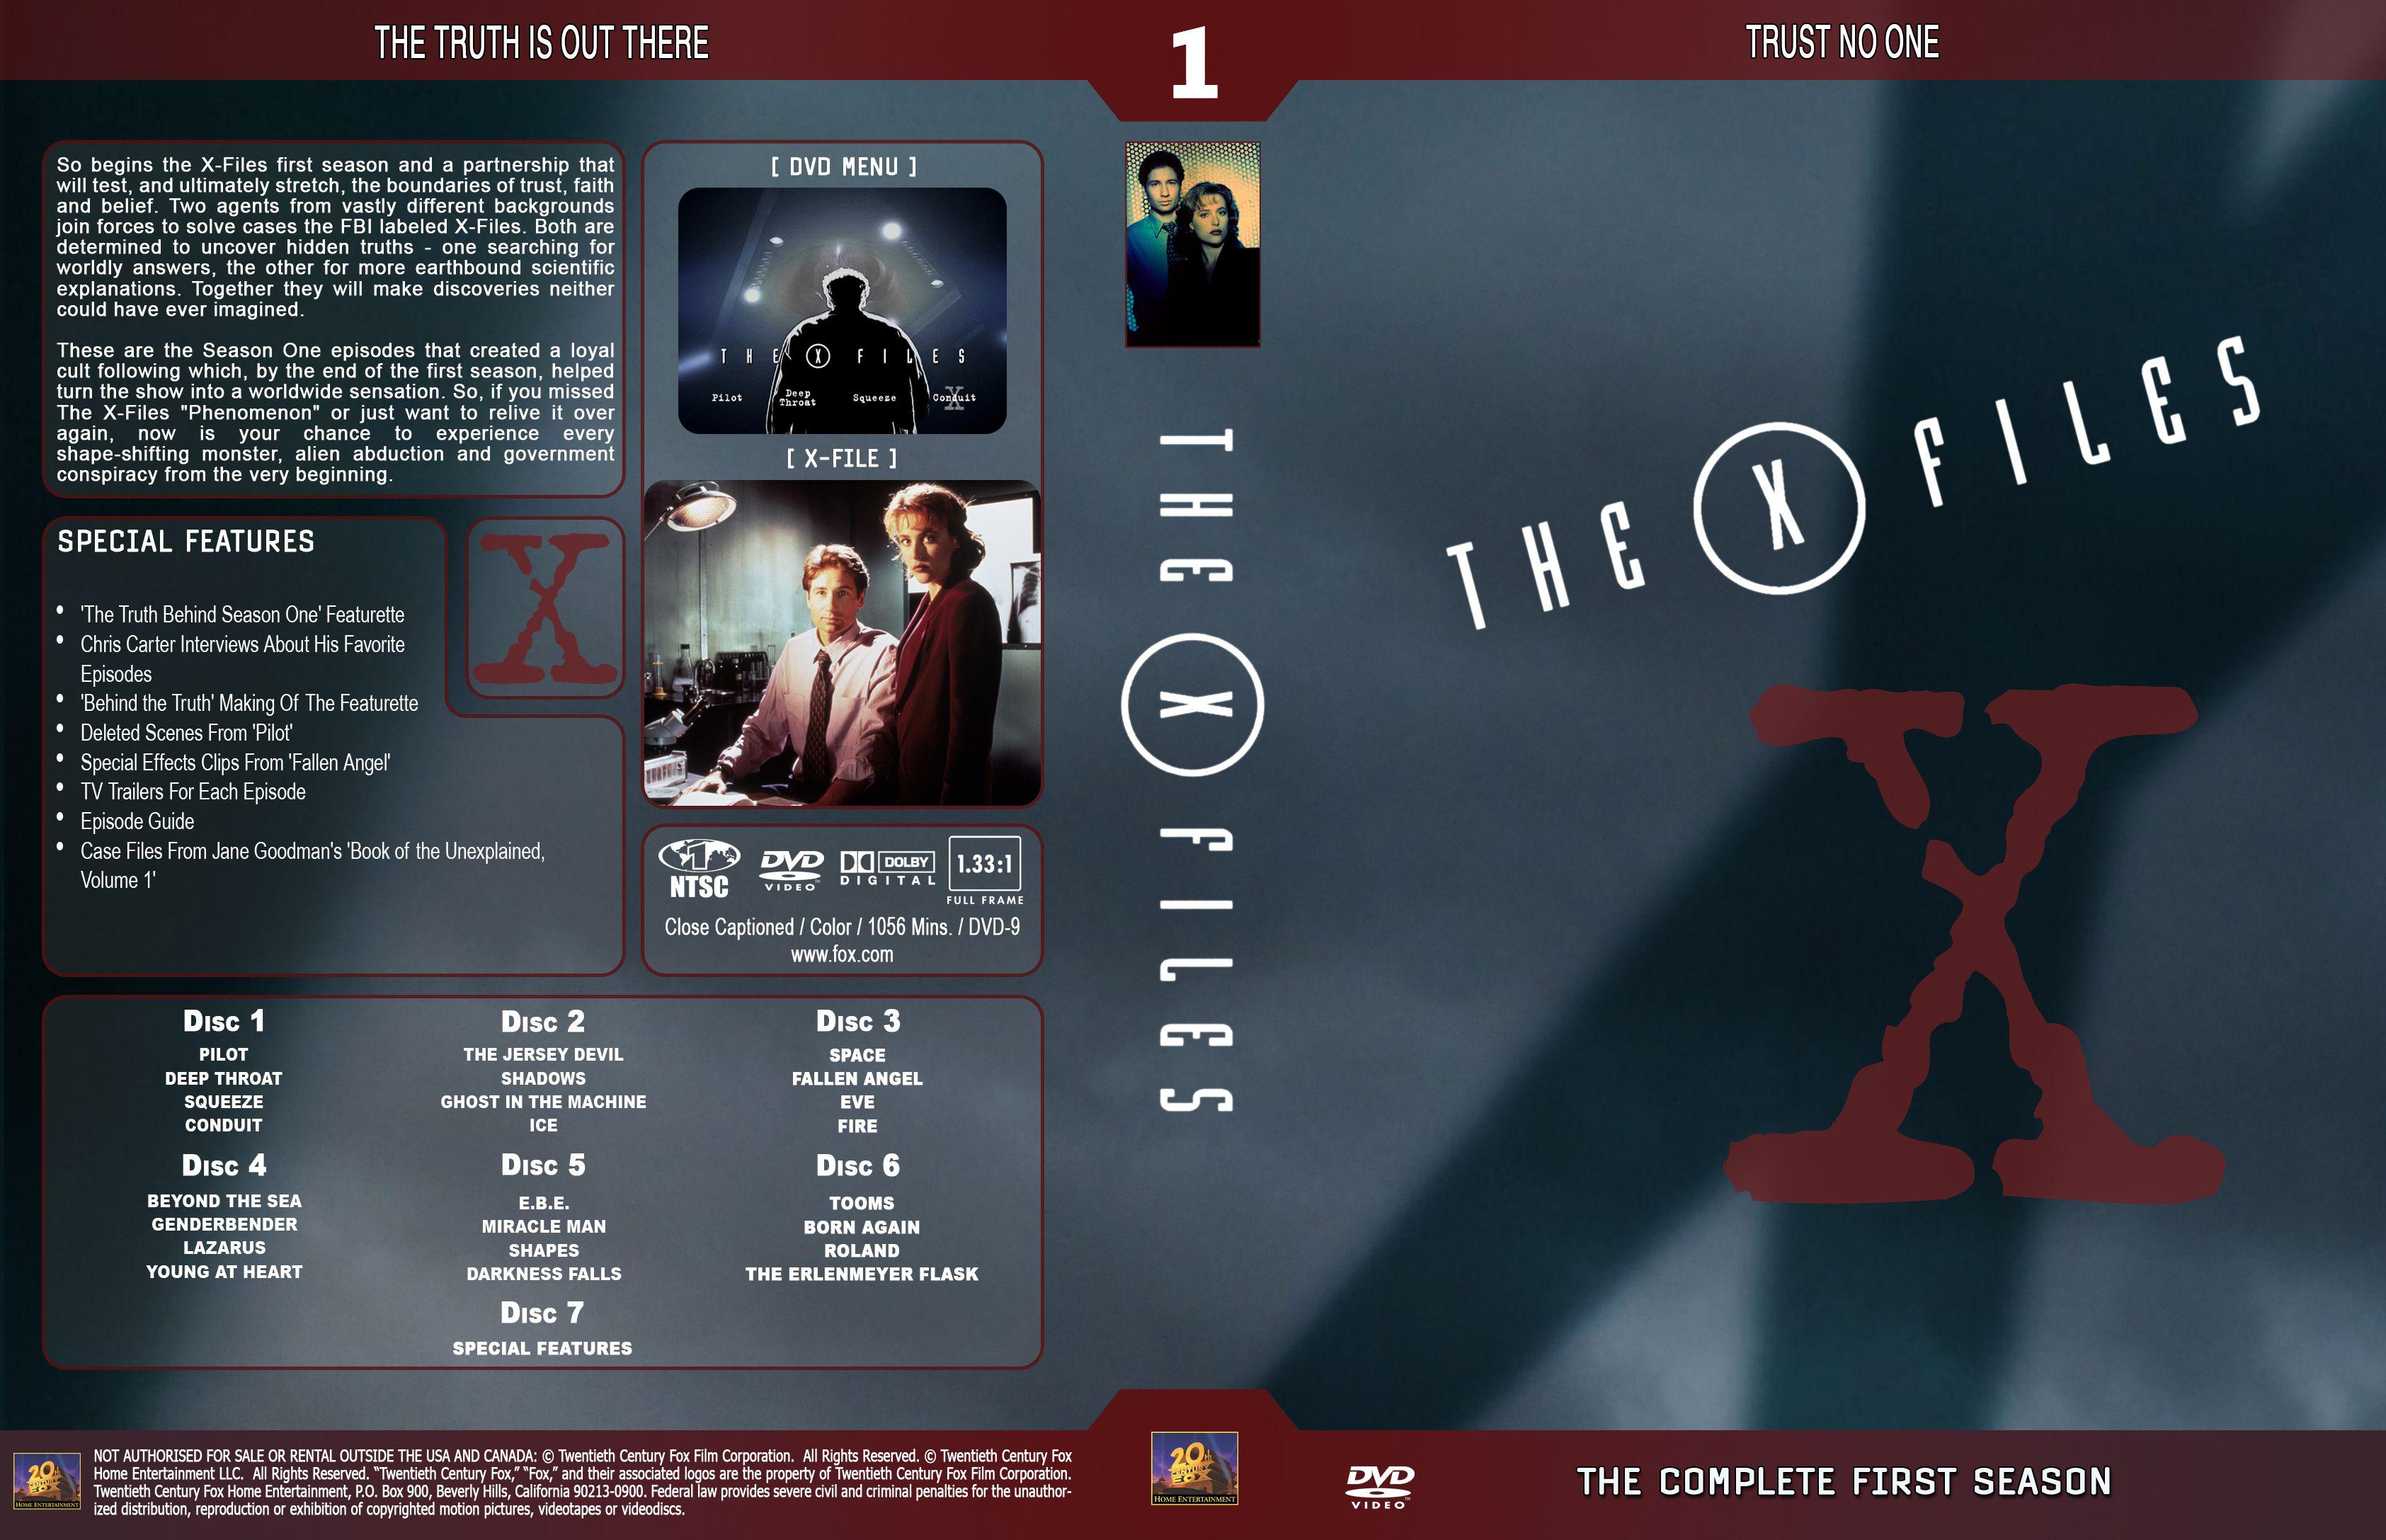 X-files season 4 volume 1.